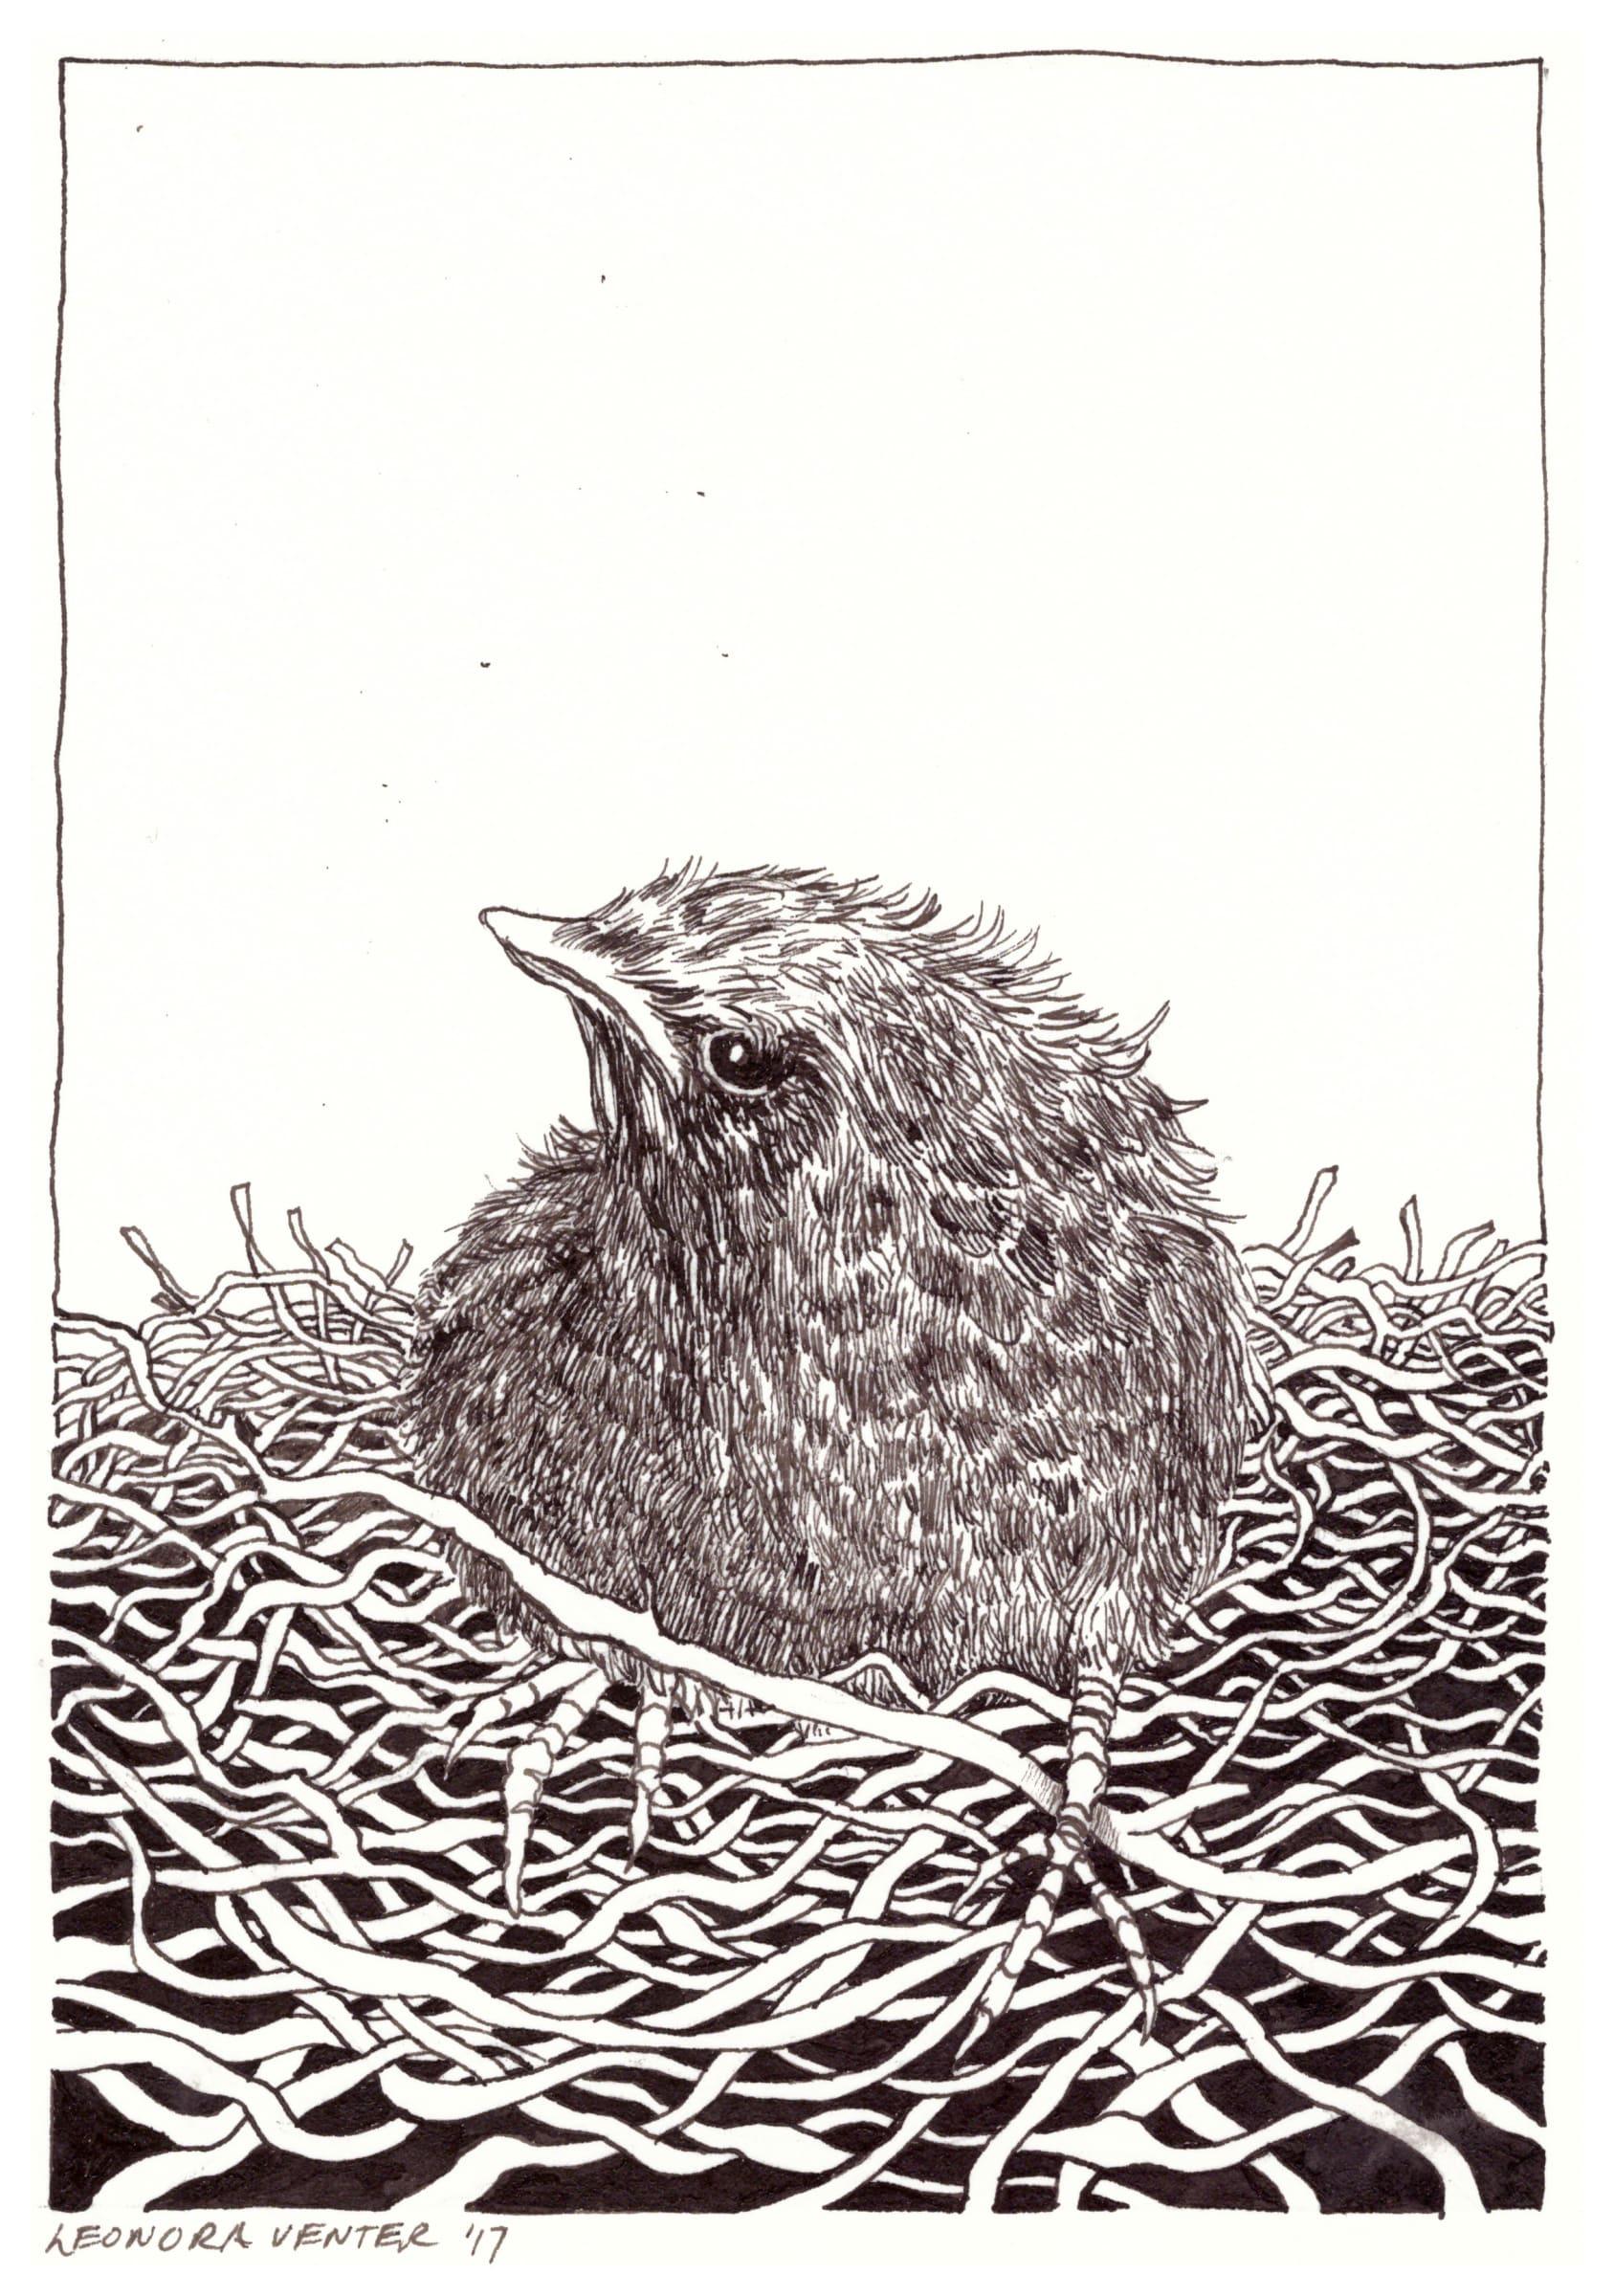 <span class=&#34;link fancybox-details-link&#34;><a href=&#34;/artists/71-leonora-venter/works/2257-leonora-venter-bird-and-nest-2017/&#34;>View Detail Page</a></span><div class=&#34;artist&#34;><strong>Leonora Venter</strong></div> <div class=&#34;title&#34;><em>Bird And Nest</em>, 2017</div> <div class=&#34;medium&#34;>Ink On Paper</div> <div class=&#34;dimensions&#34;>14.5cm x 10.5cm</div><div class=&#34;price&#34;>R600.00</div>